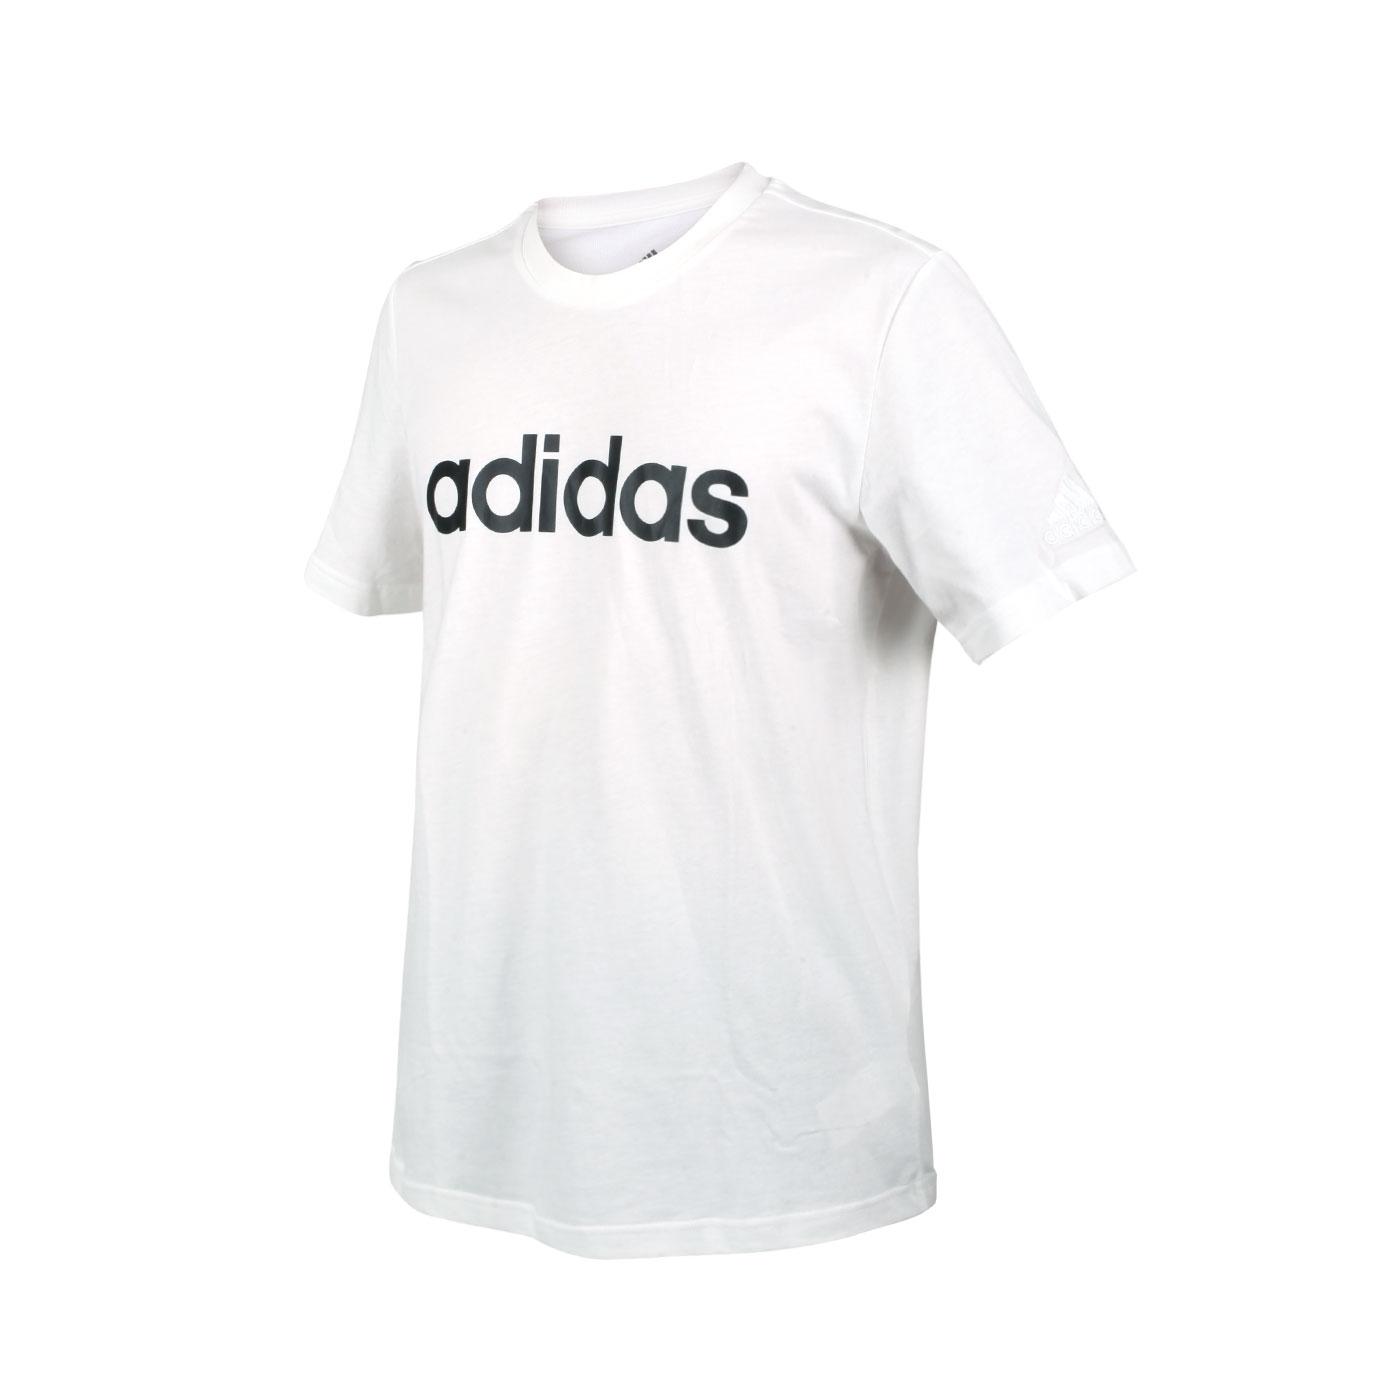 ADIDAS 男款短袖T恤 GL0058 - 白黑